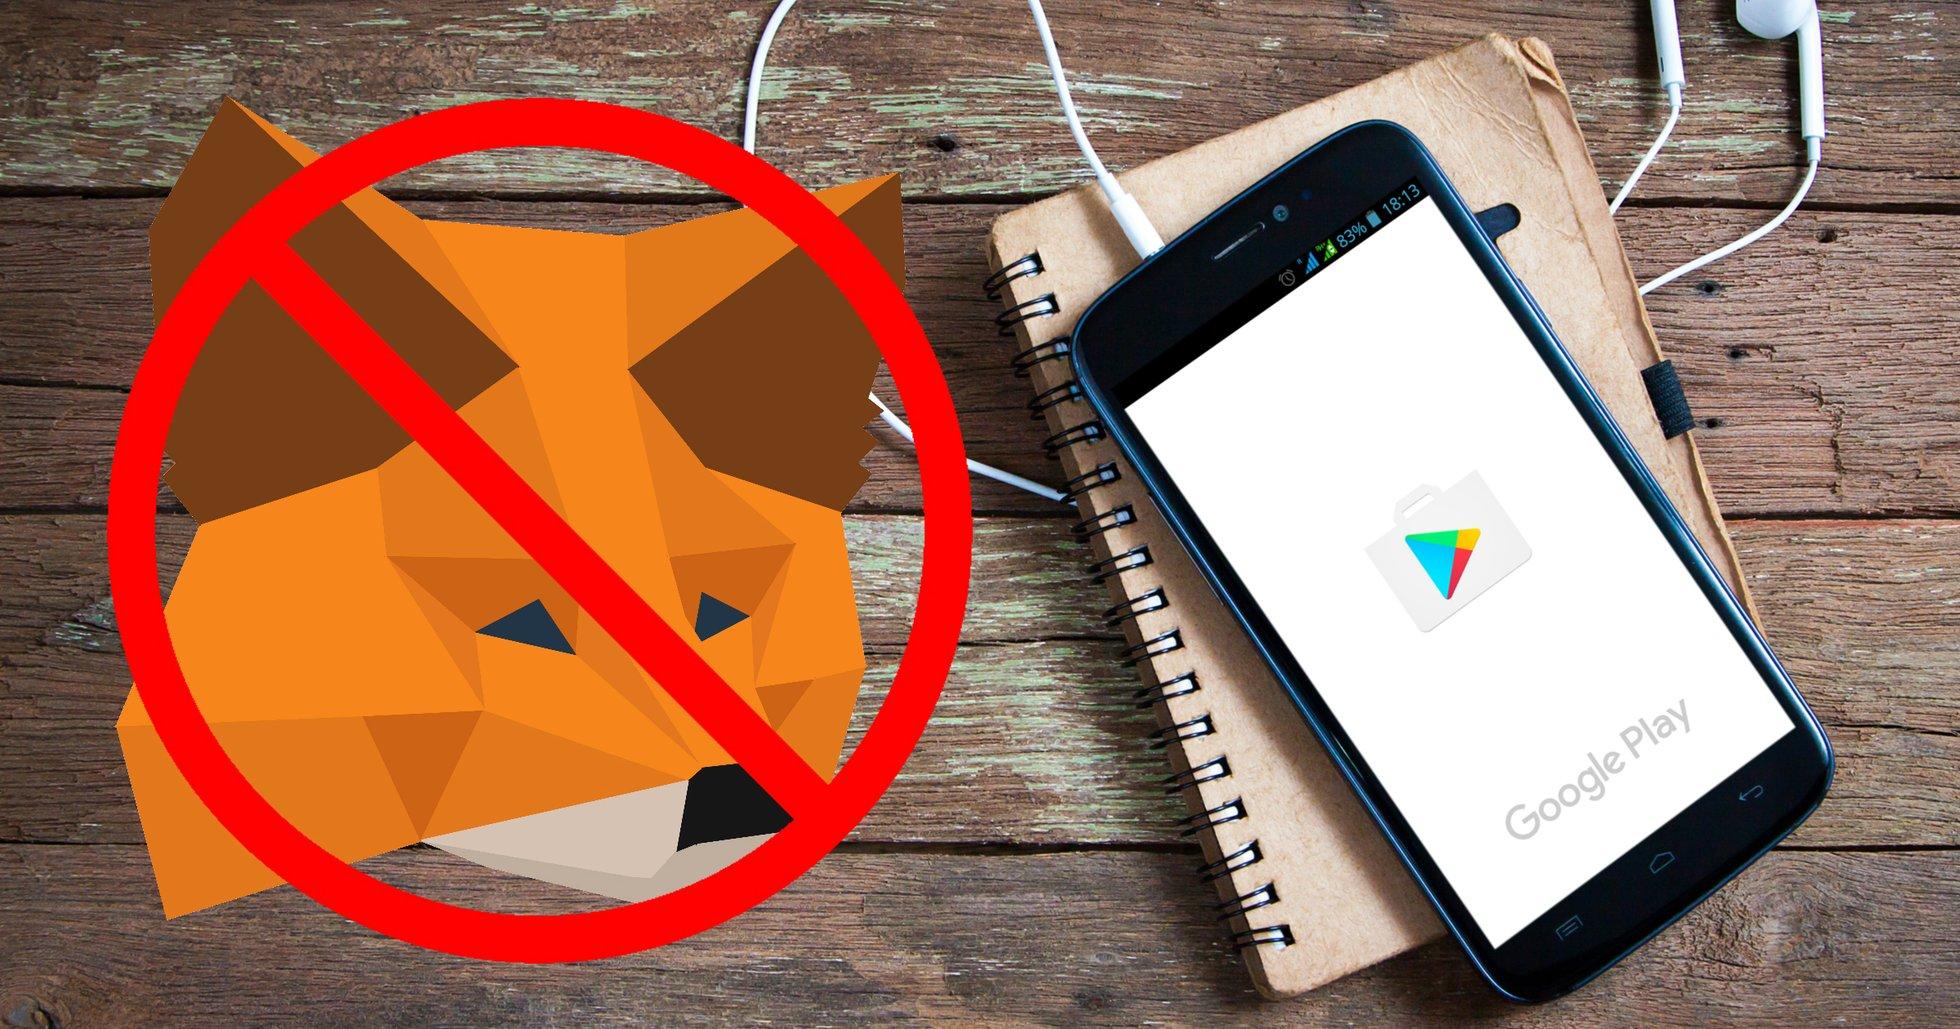 Google förbjuder ethereumplånboken Metamask i sin appbutik Google Play.